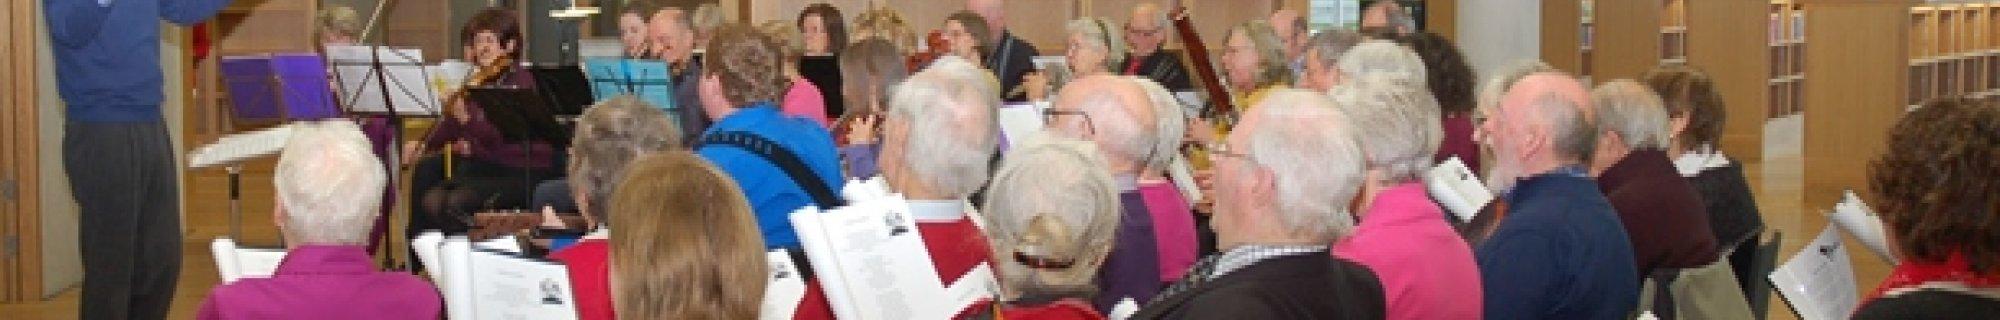 Musical Memories Choir performing in dlr LexIcon December 2014